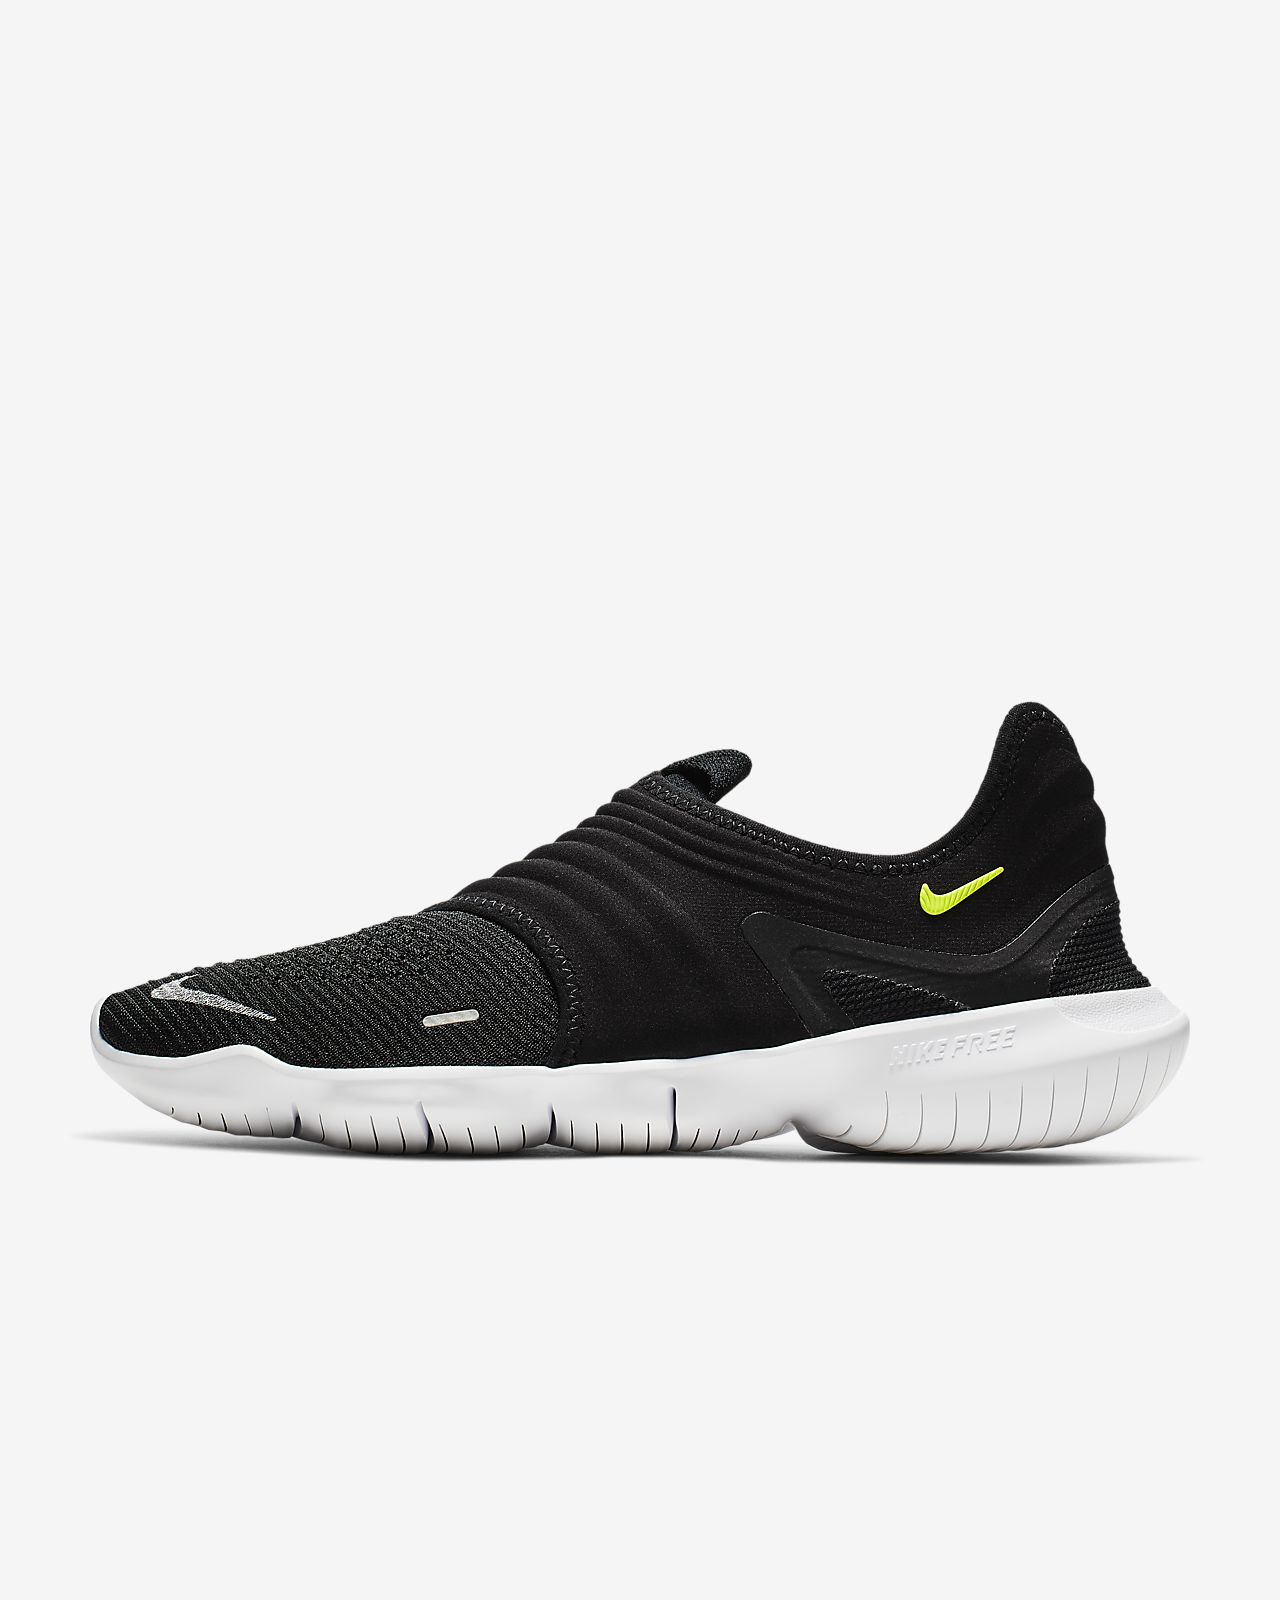 e05ad2c7a Nike Free RN Flyknit 3.0 løpesko til herre